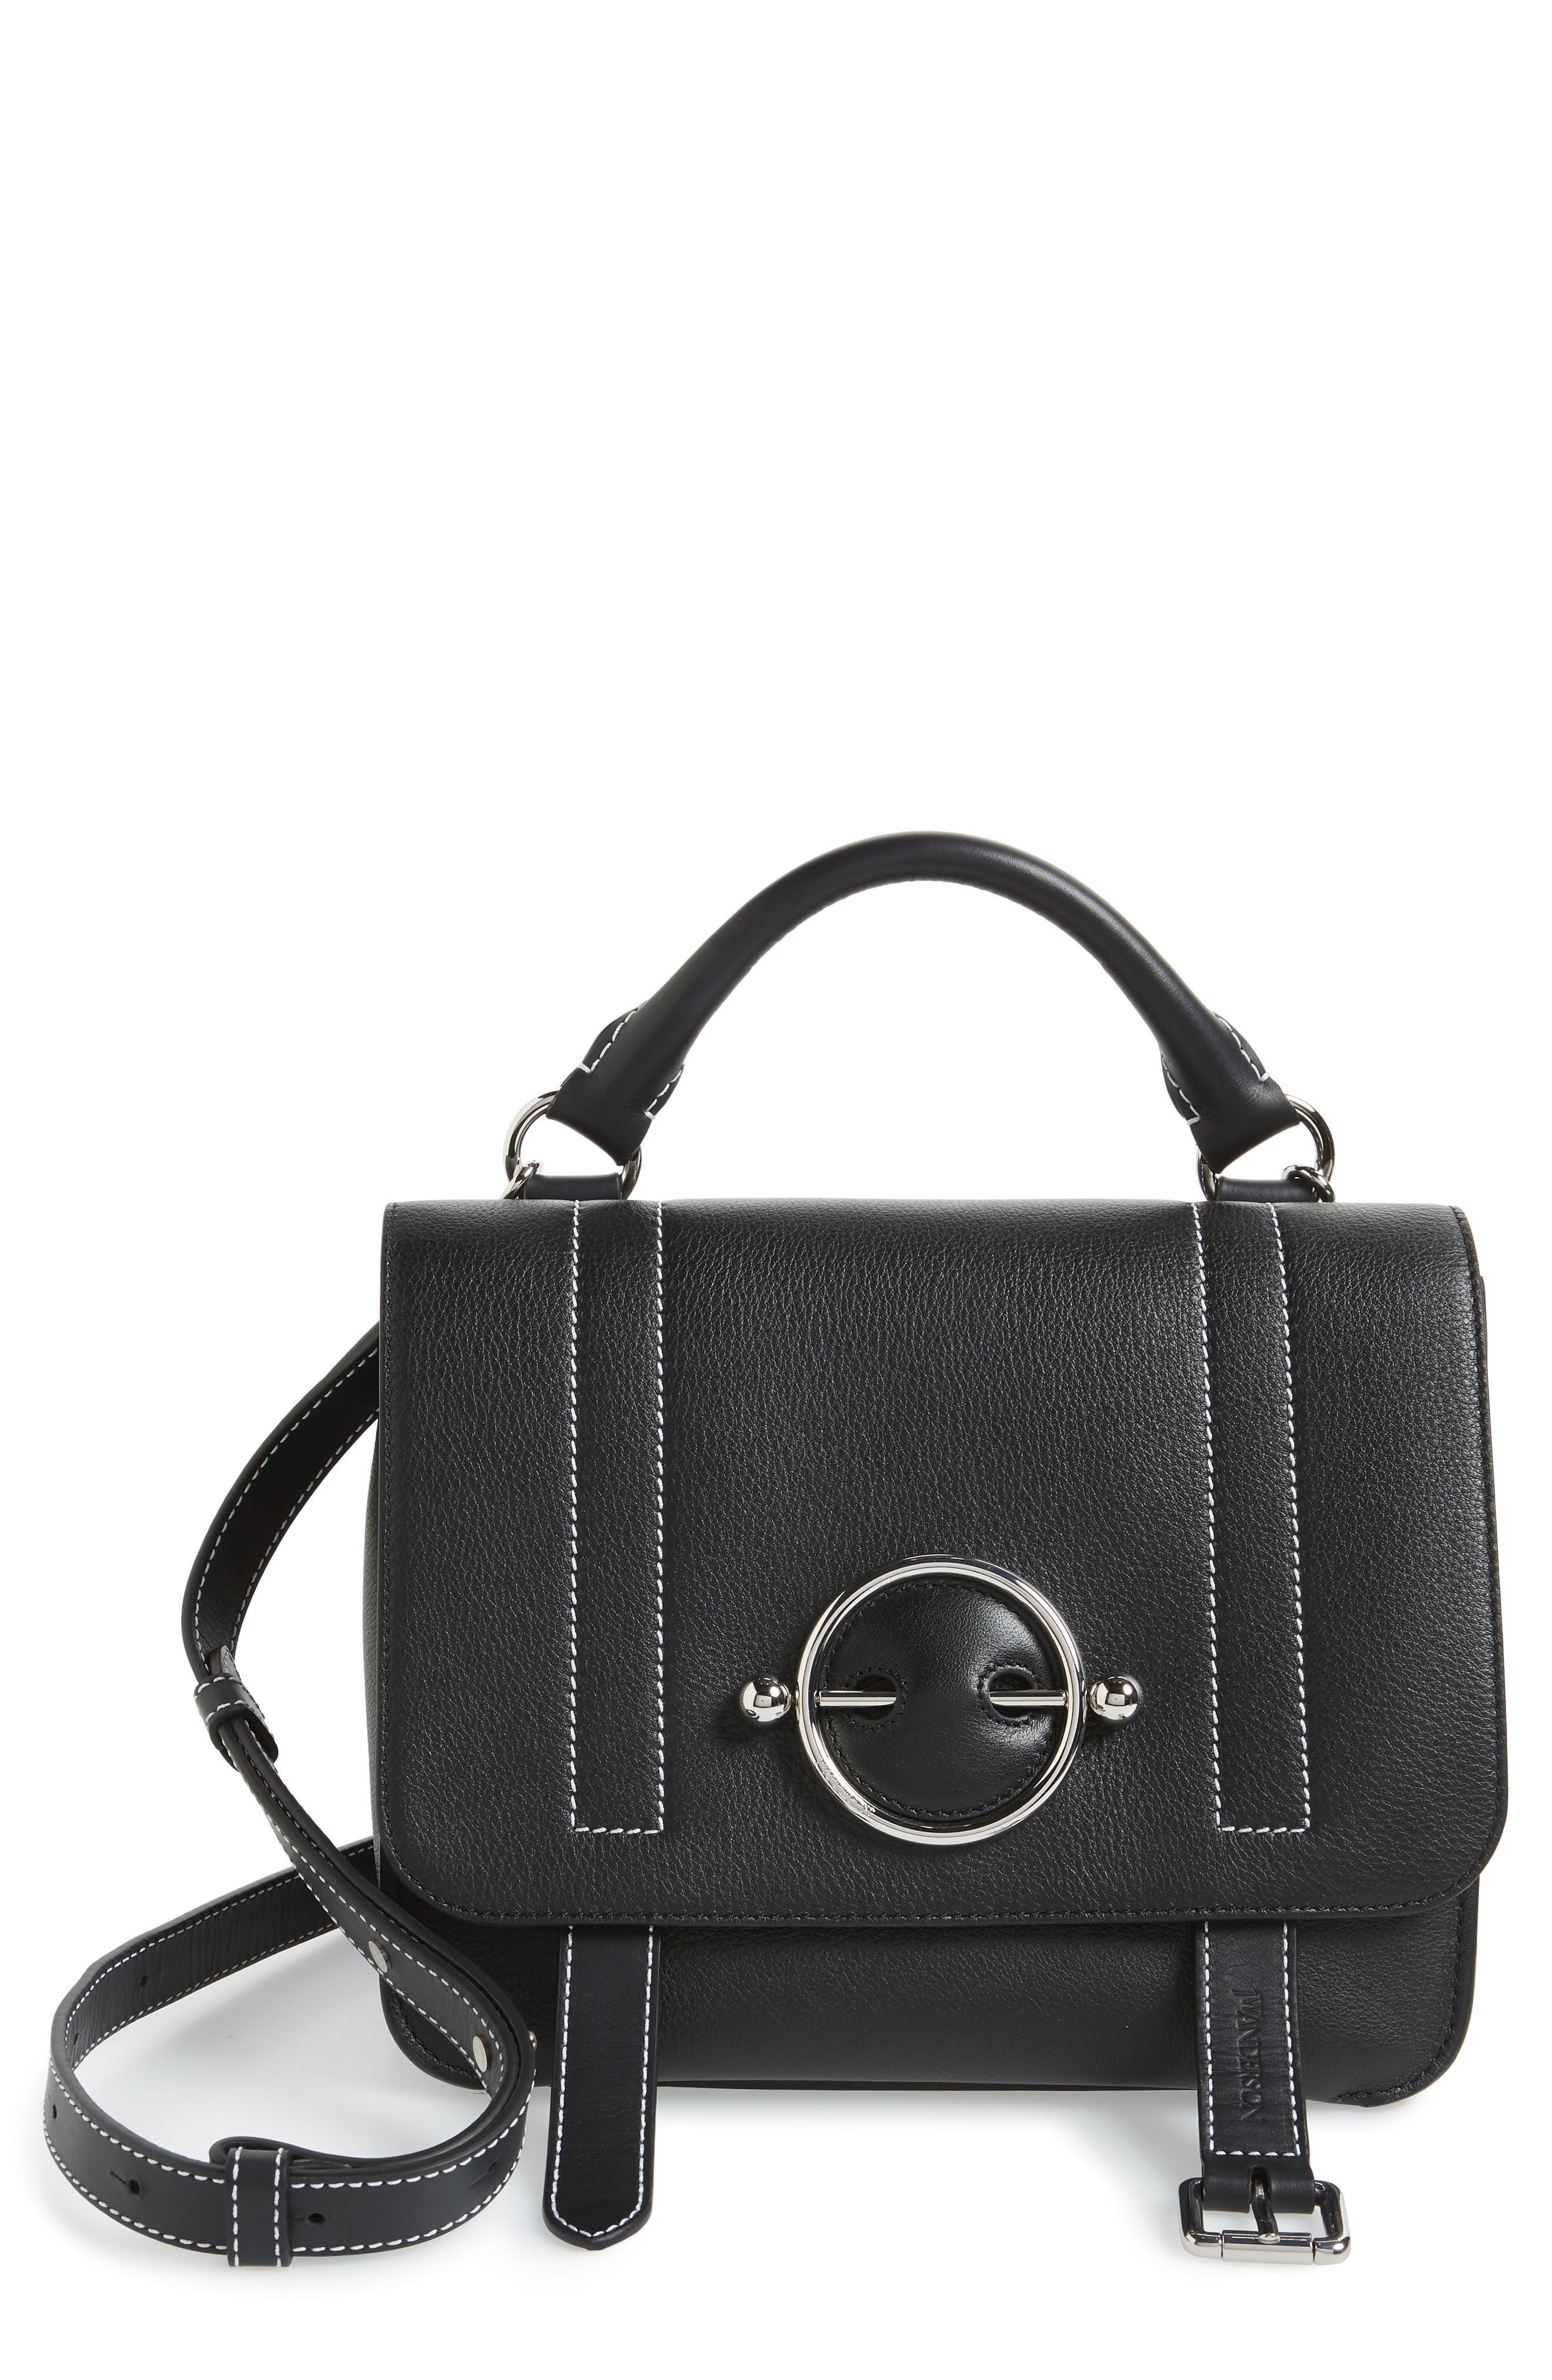 JW ANDERSON Disc Leather Top Handle Satchel, Main, color, BLACK